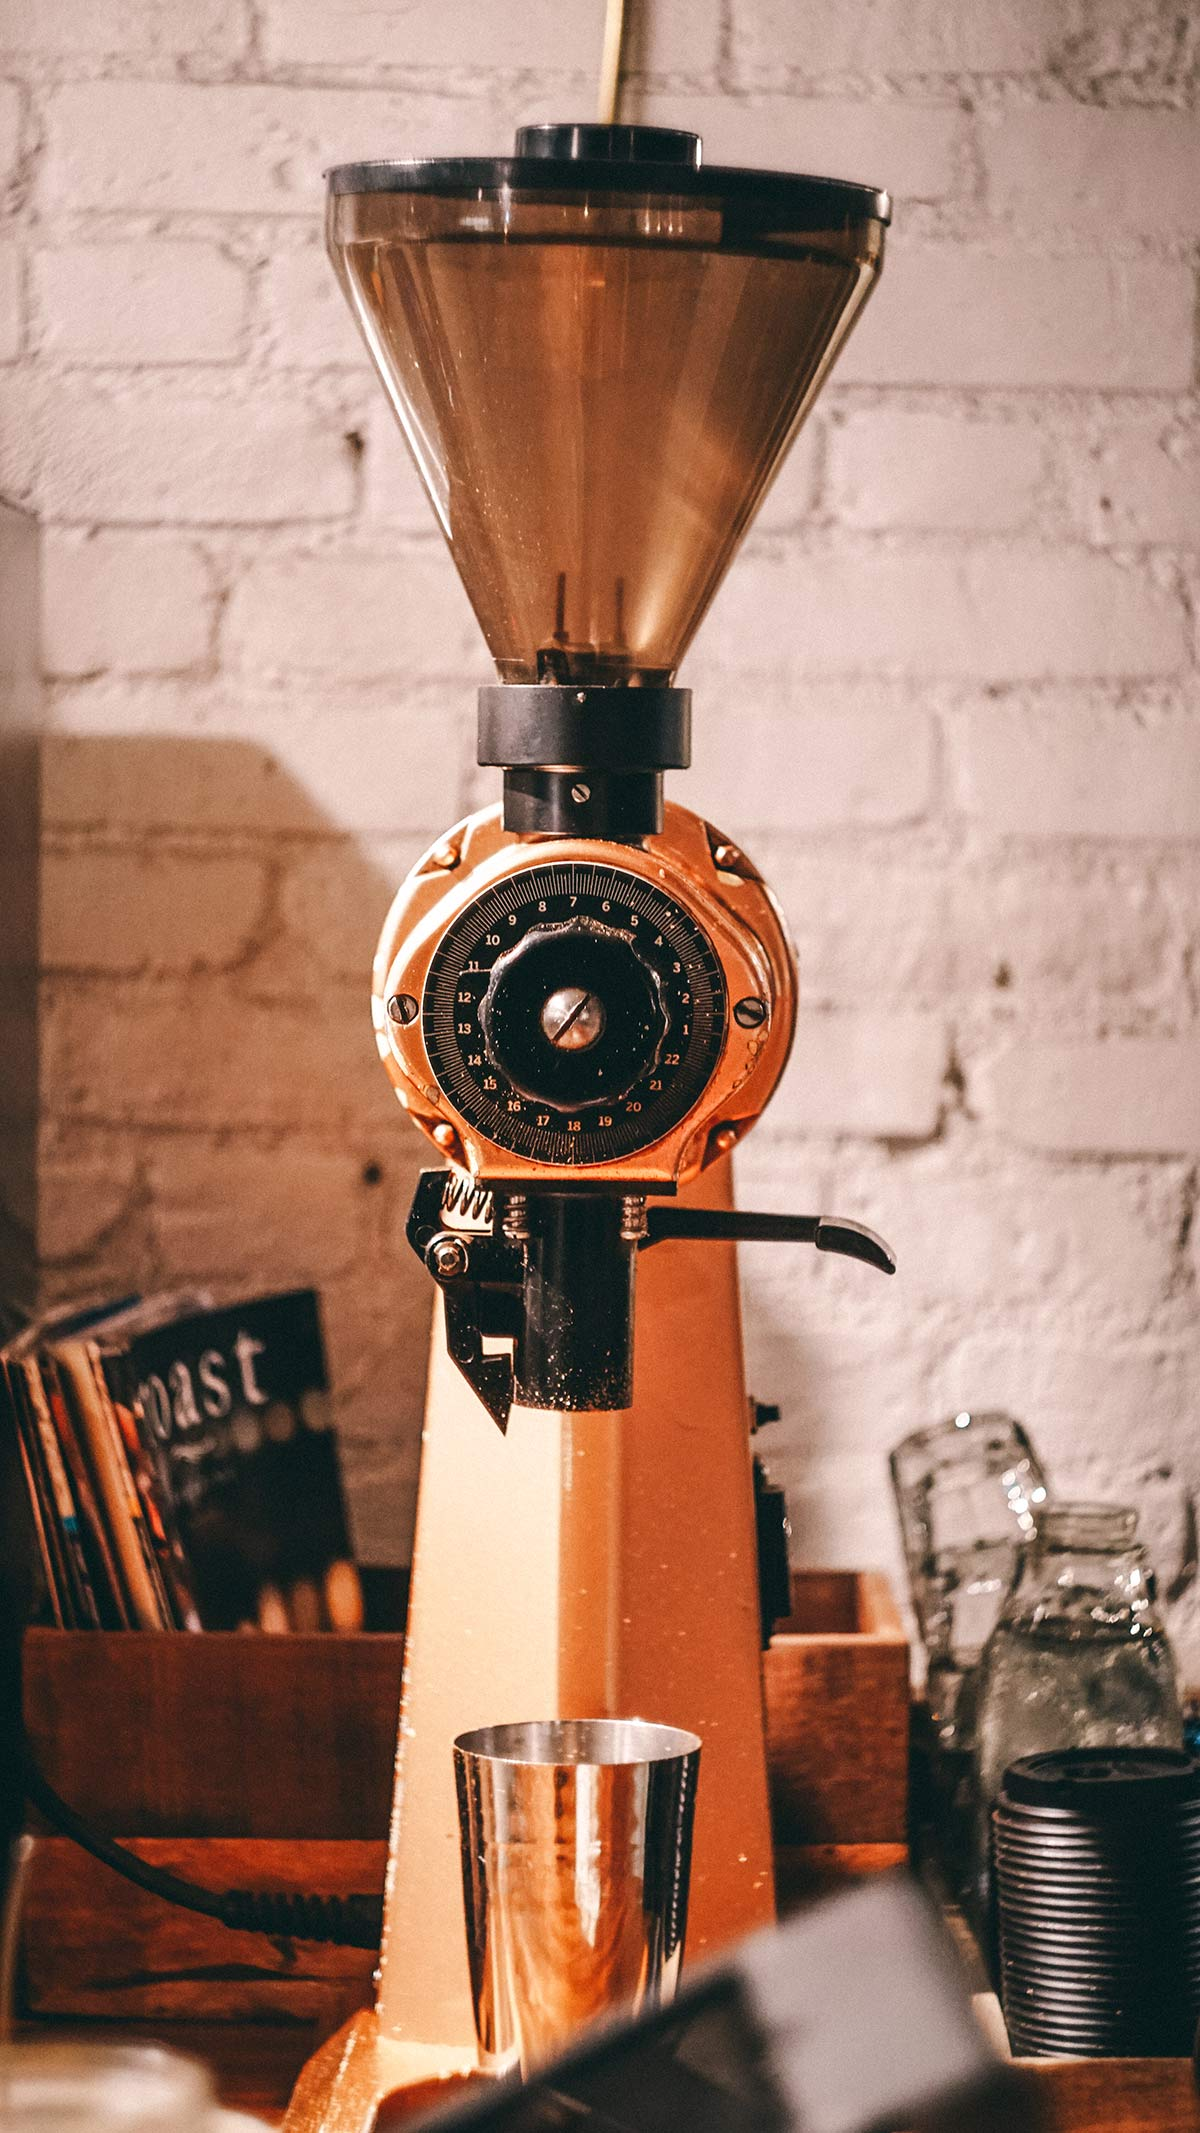 Forth Cafe Kaffee